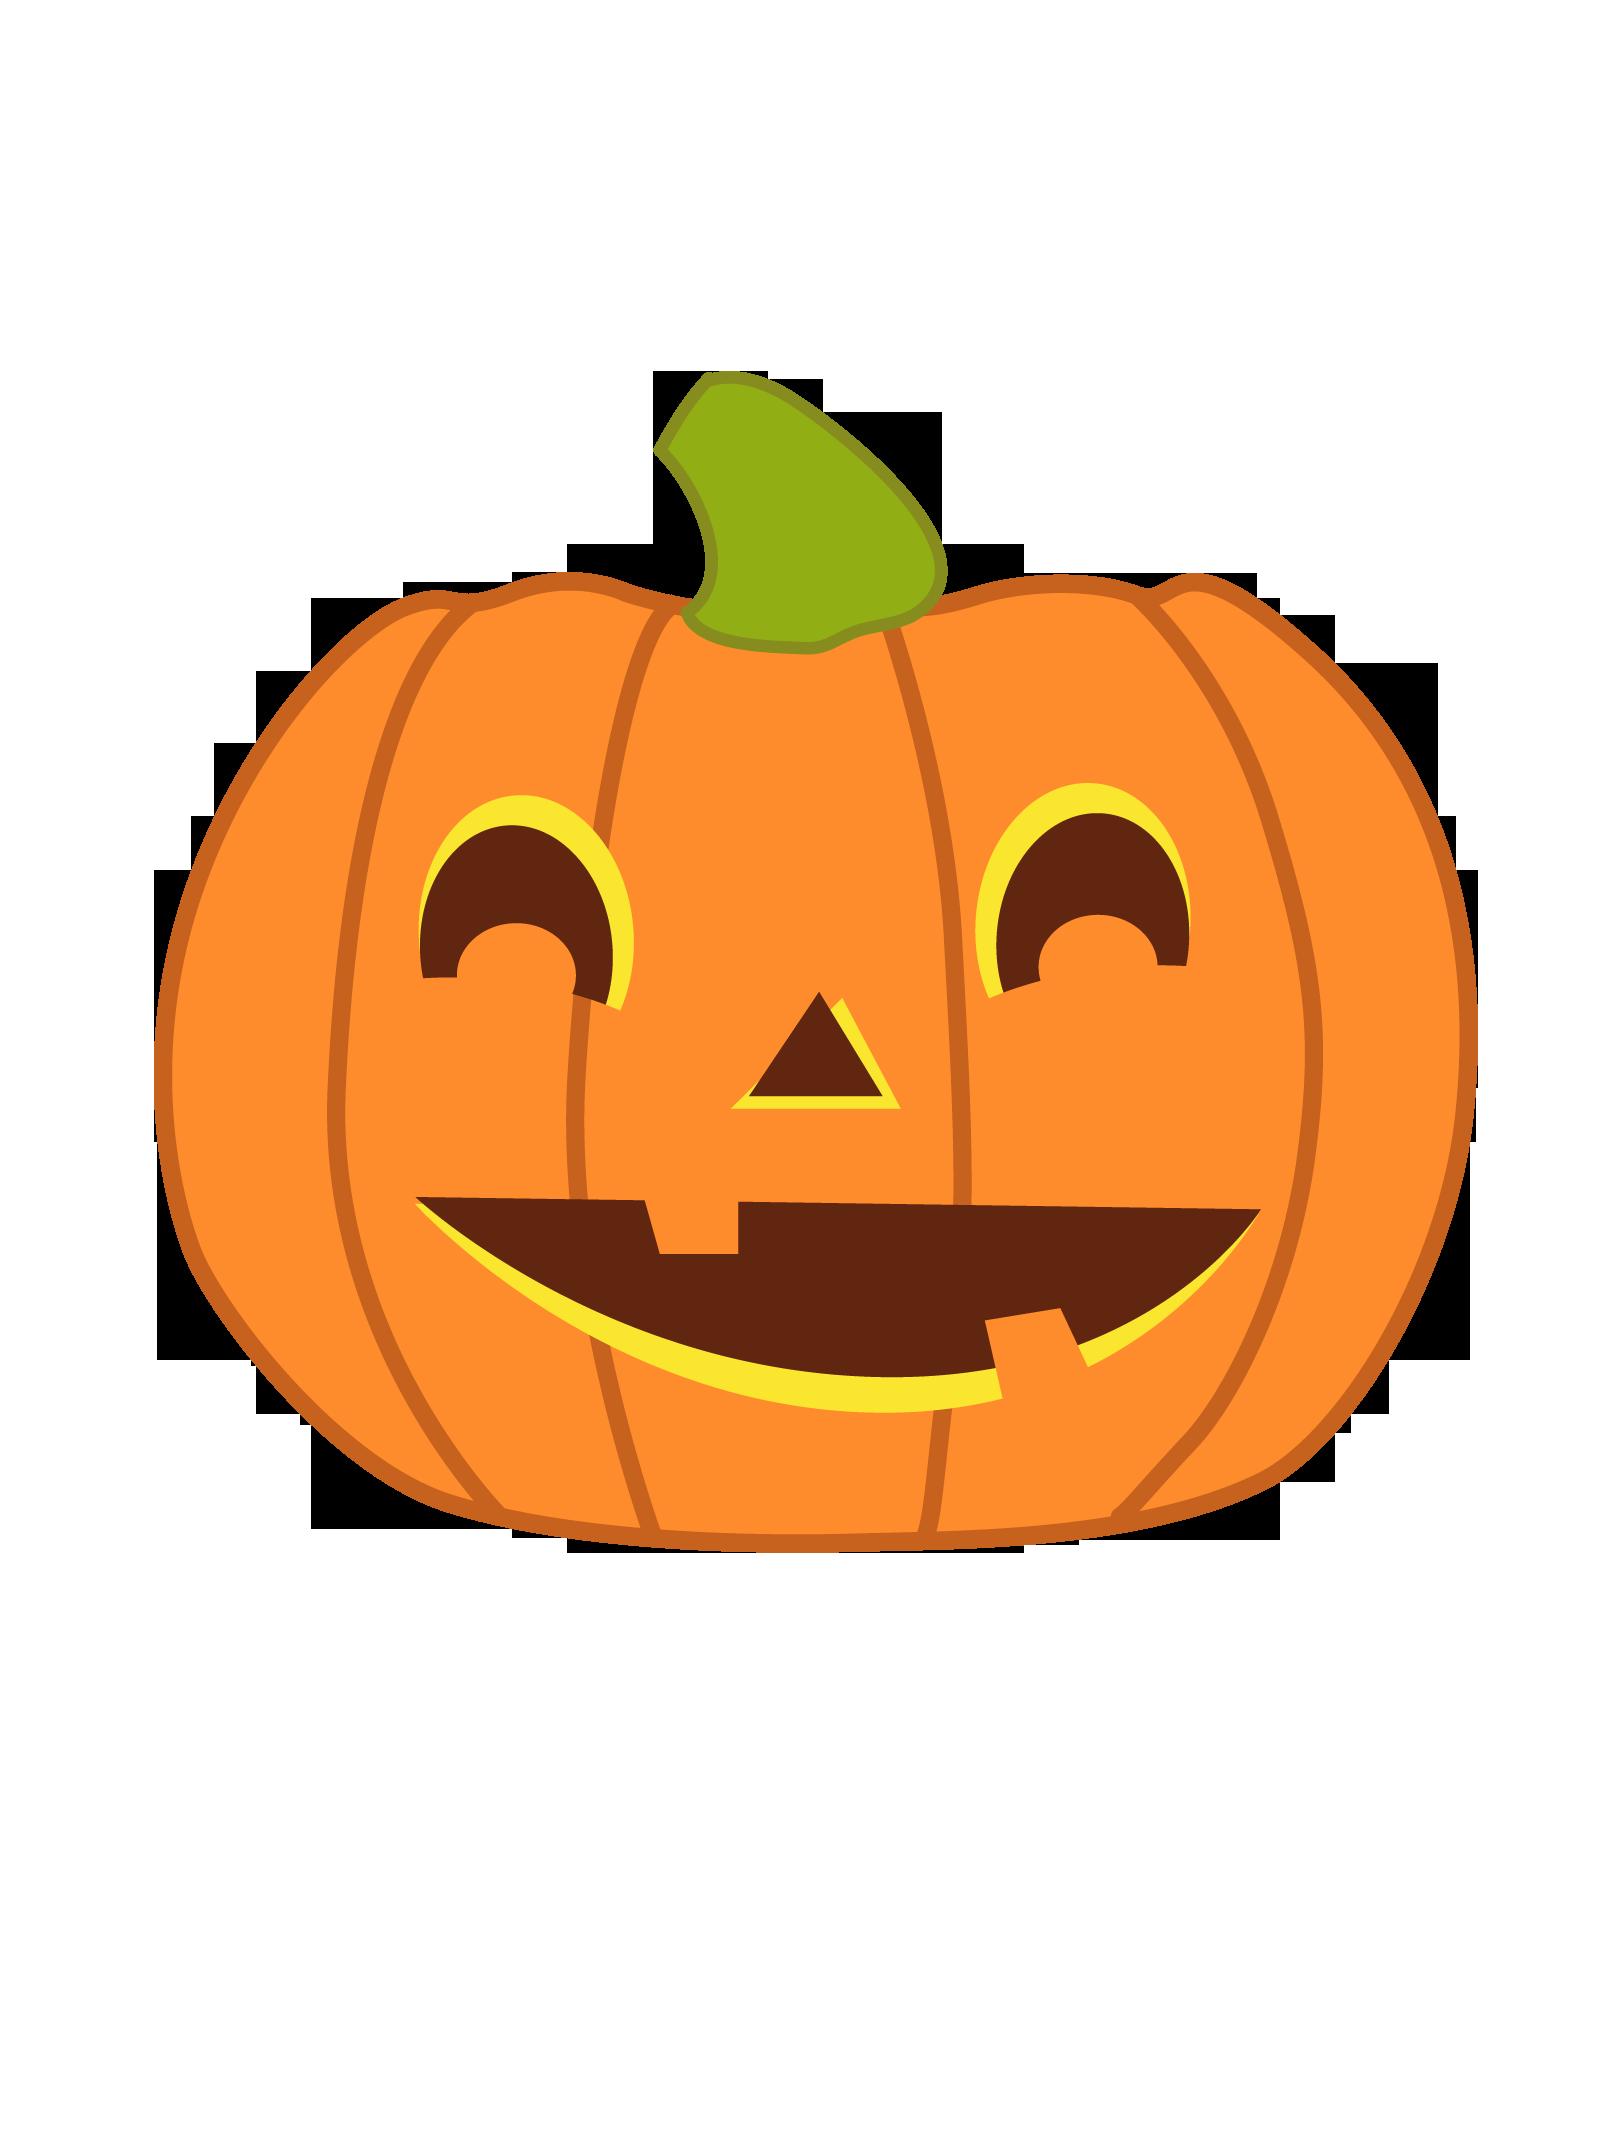 Pumpkin clipart solid. Cute halloween google search